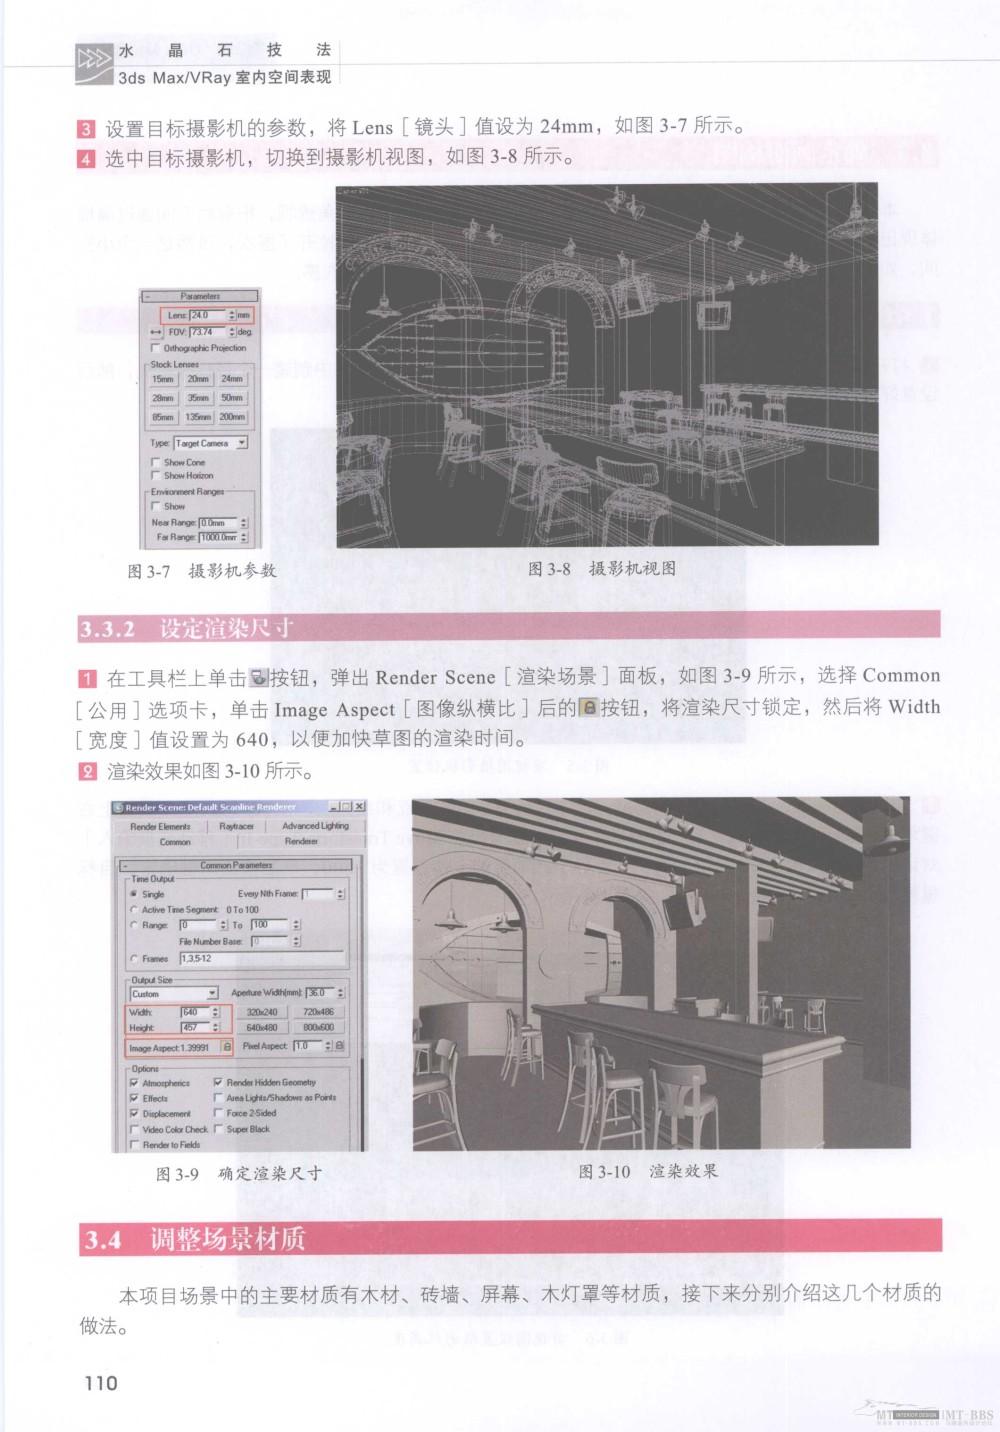 水晶石技法-3ds_Max&VRay室内空间表现_水晶石技法-3ds_Max&VRay室内空间表现_页面_116.jpg